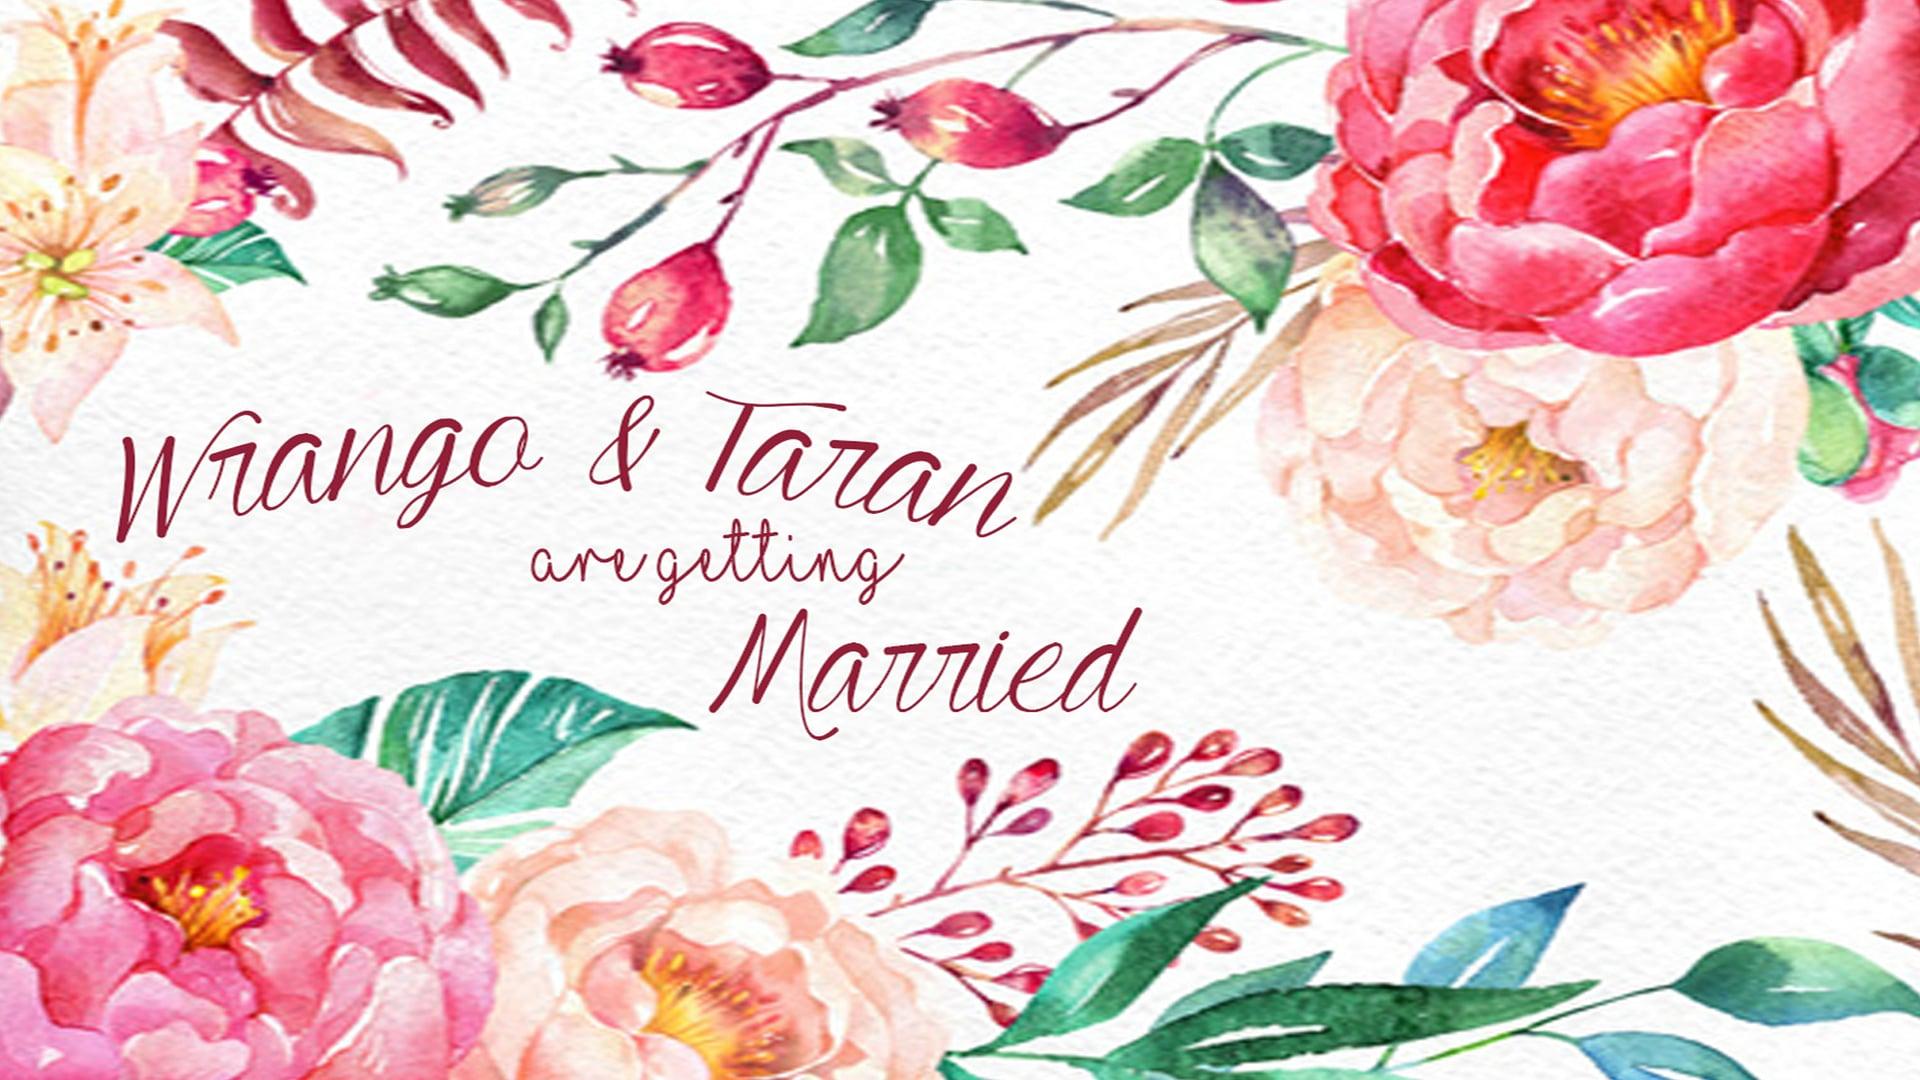 Wrango and Taran are Getting Married